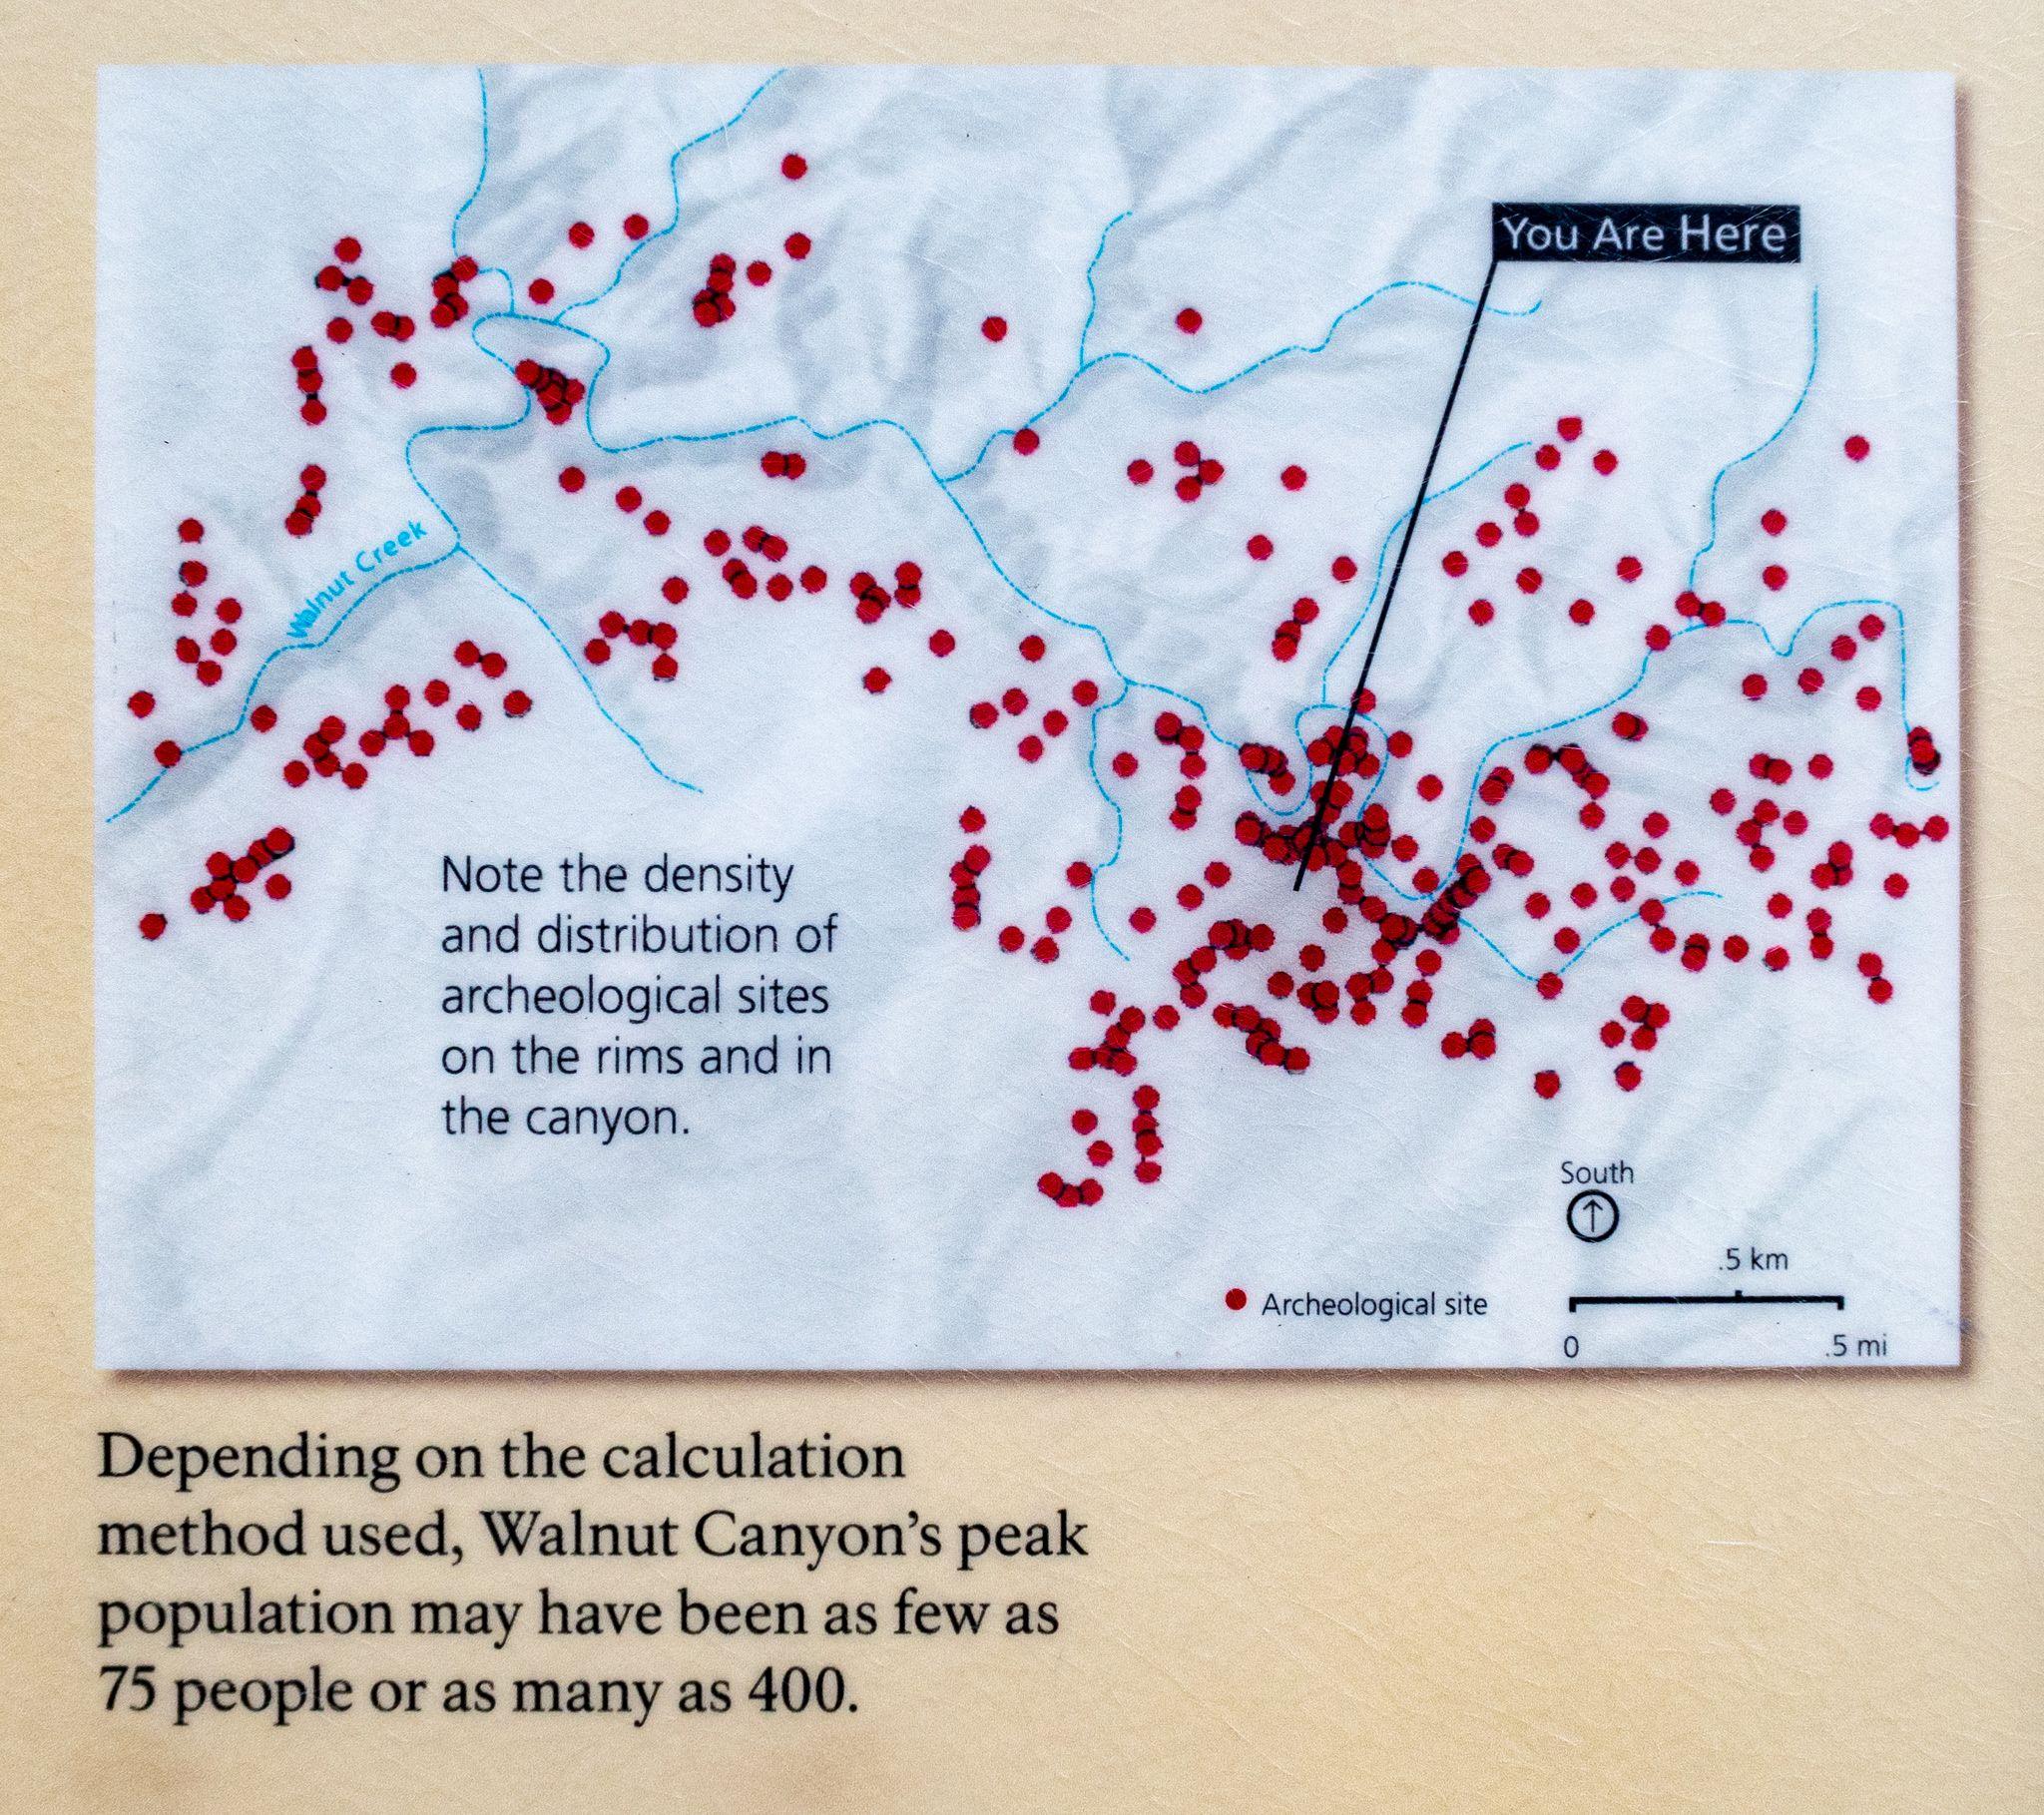 Walnut Canyon Archaeological Sites